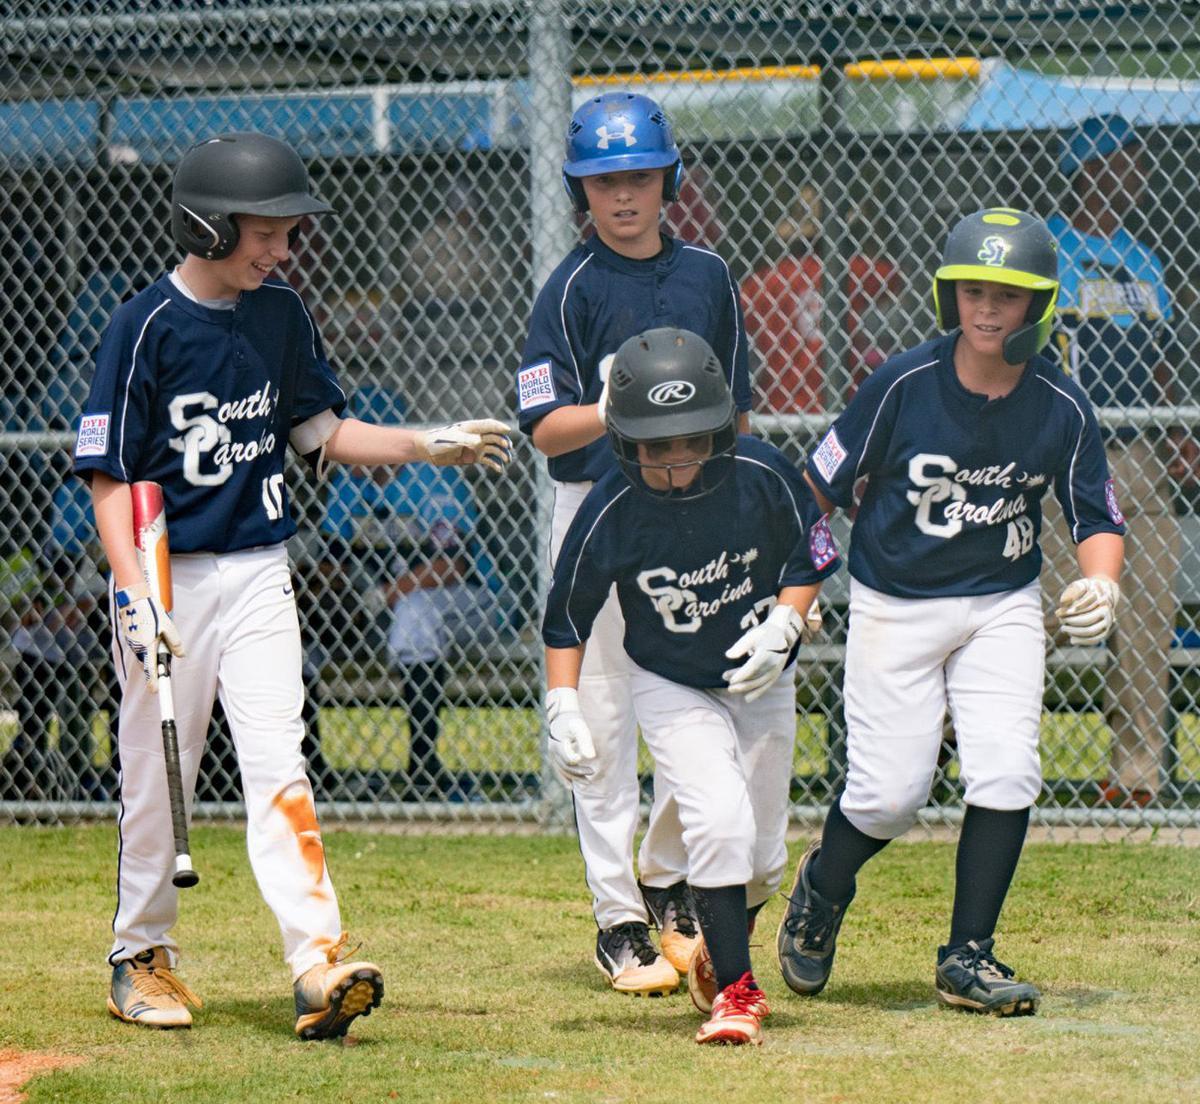 Mullins baseball all-stars win World Series opener | Sports | scnow com